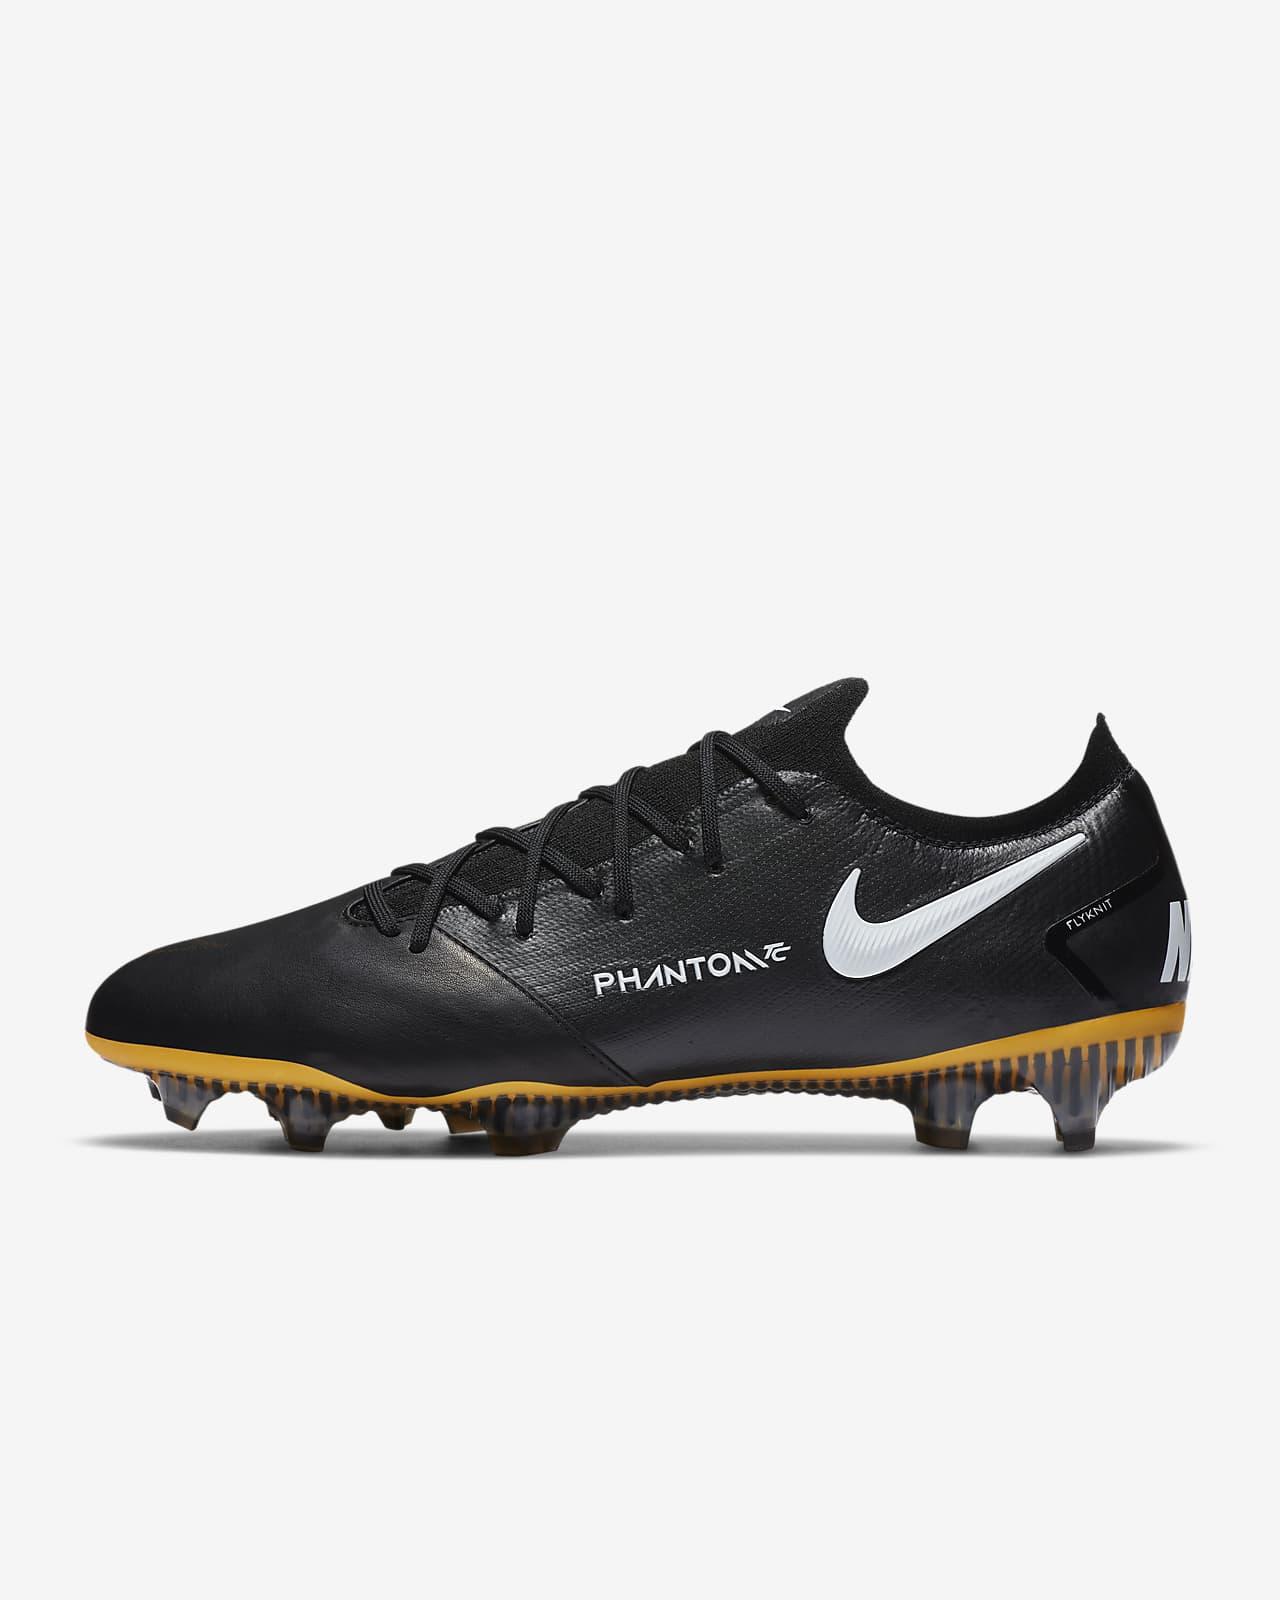 Nike Phantom GT Elite Tech Craft FG Firm-Ground Football Boot